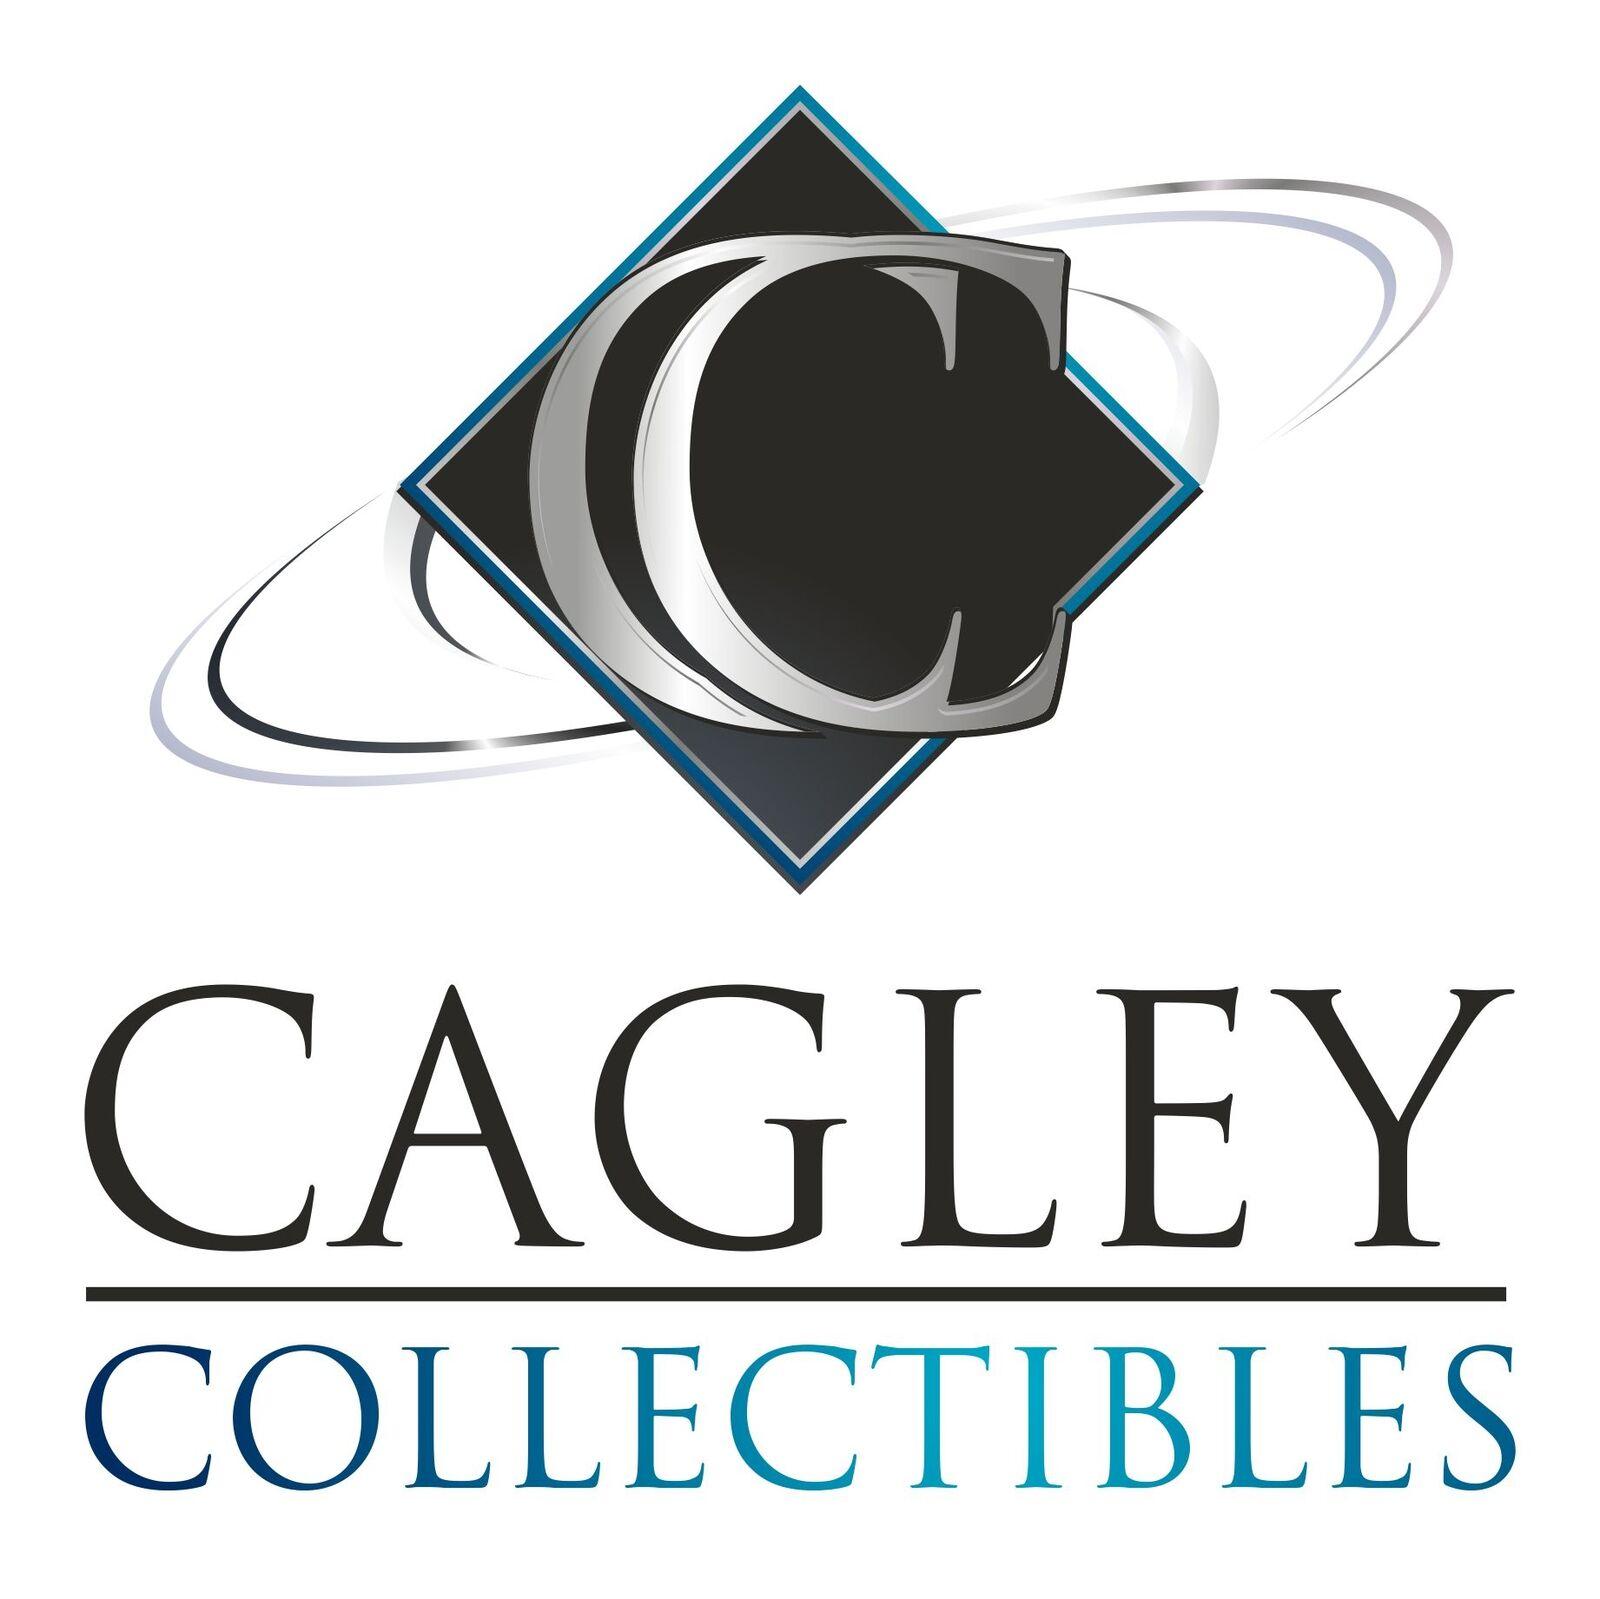 Cagley Collectibles